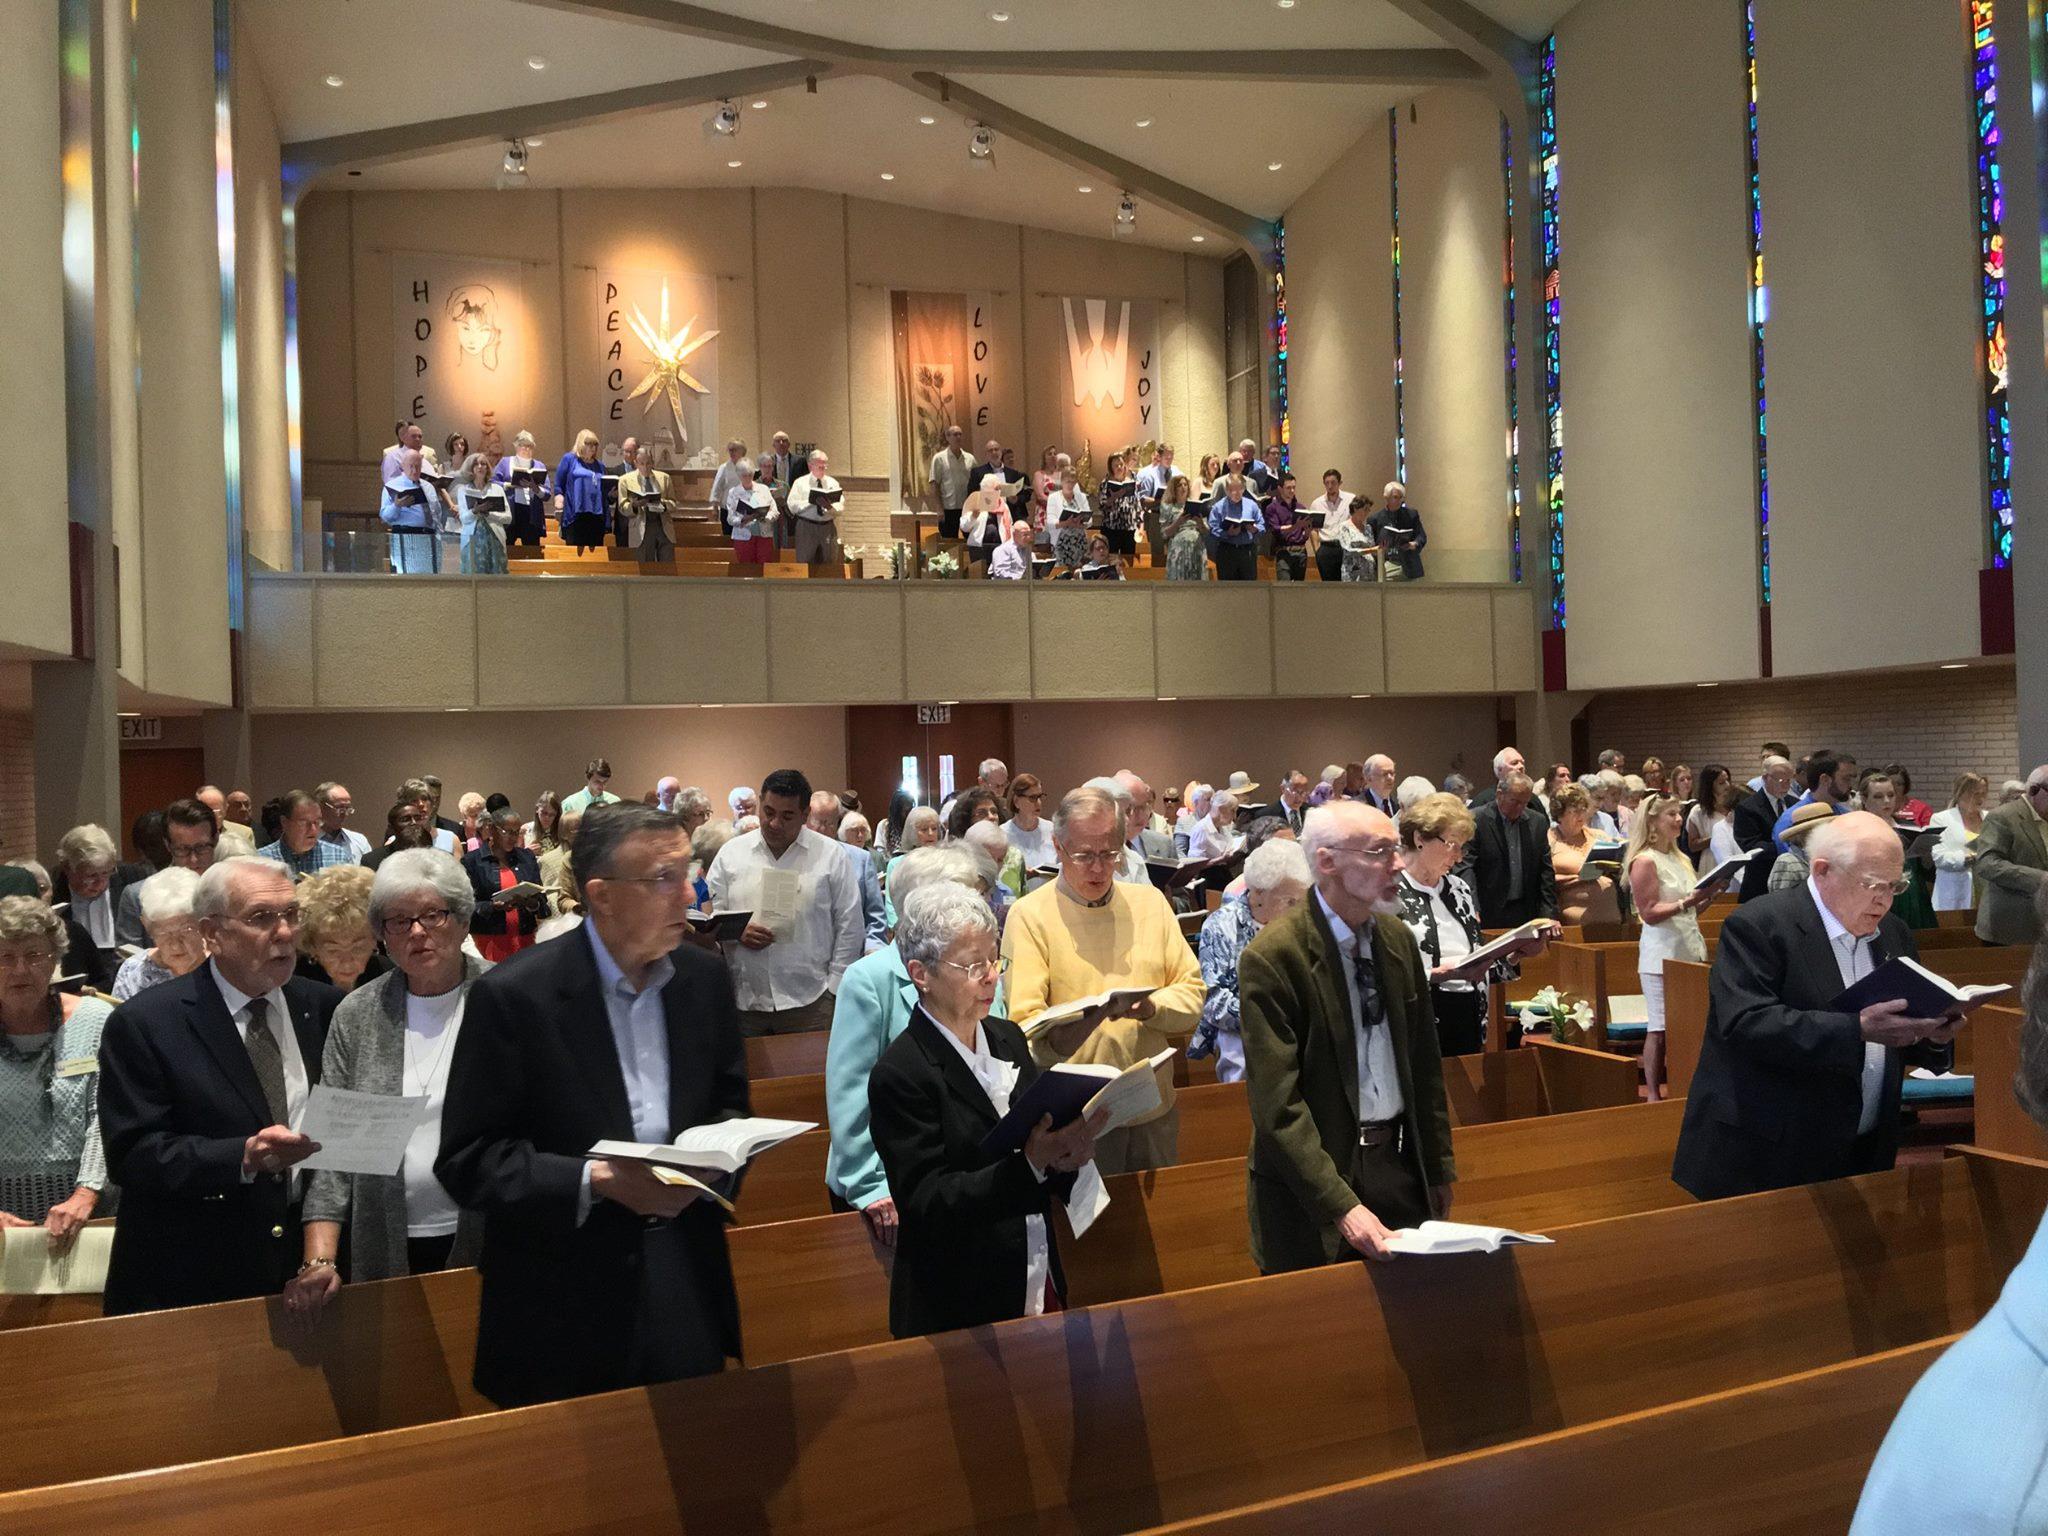 claremont-presbyterian-church-life-service-sunday.jpg